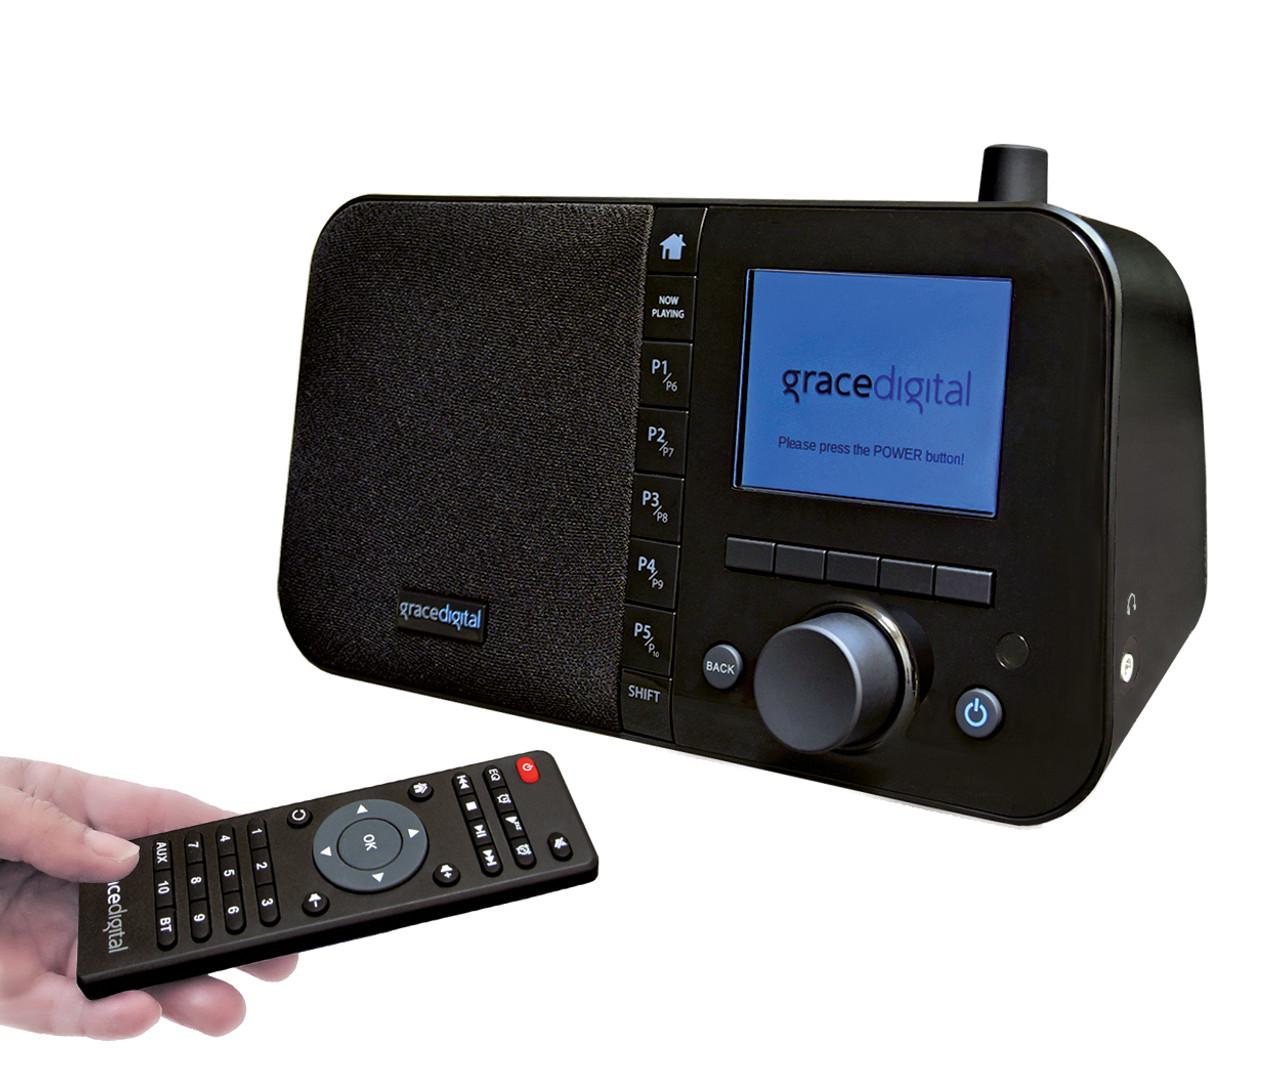 Gracedigital Mondo Elite Wifi Internet Radio Alarm Clock With Bluetooth Iheartradio Npr And Radio Com